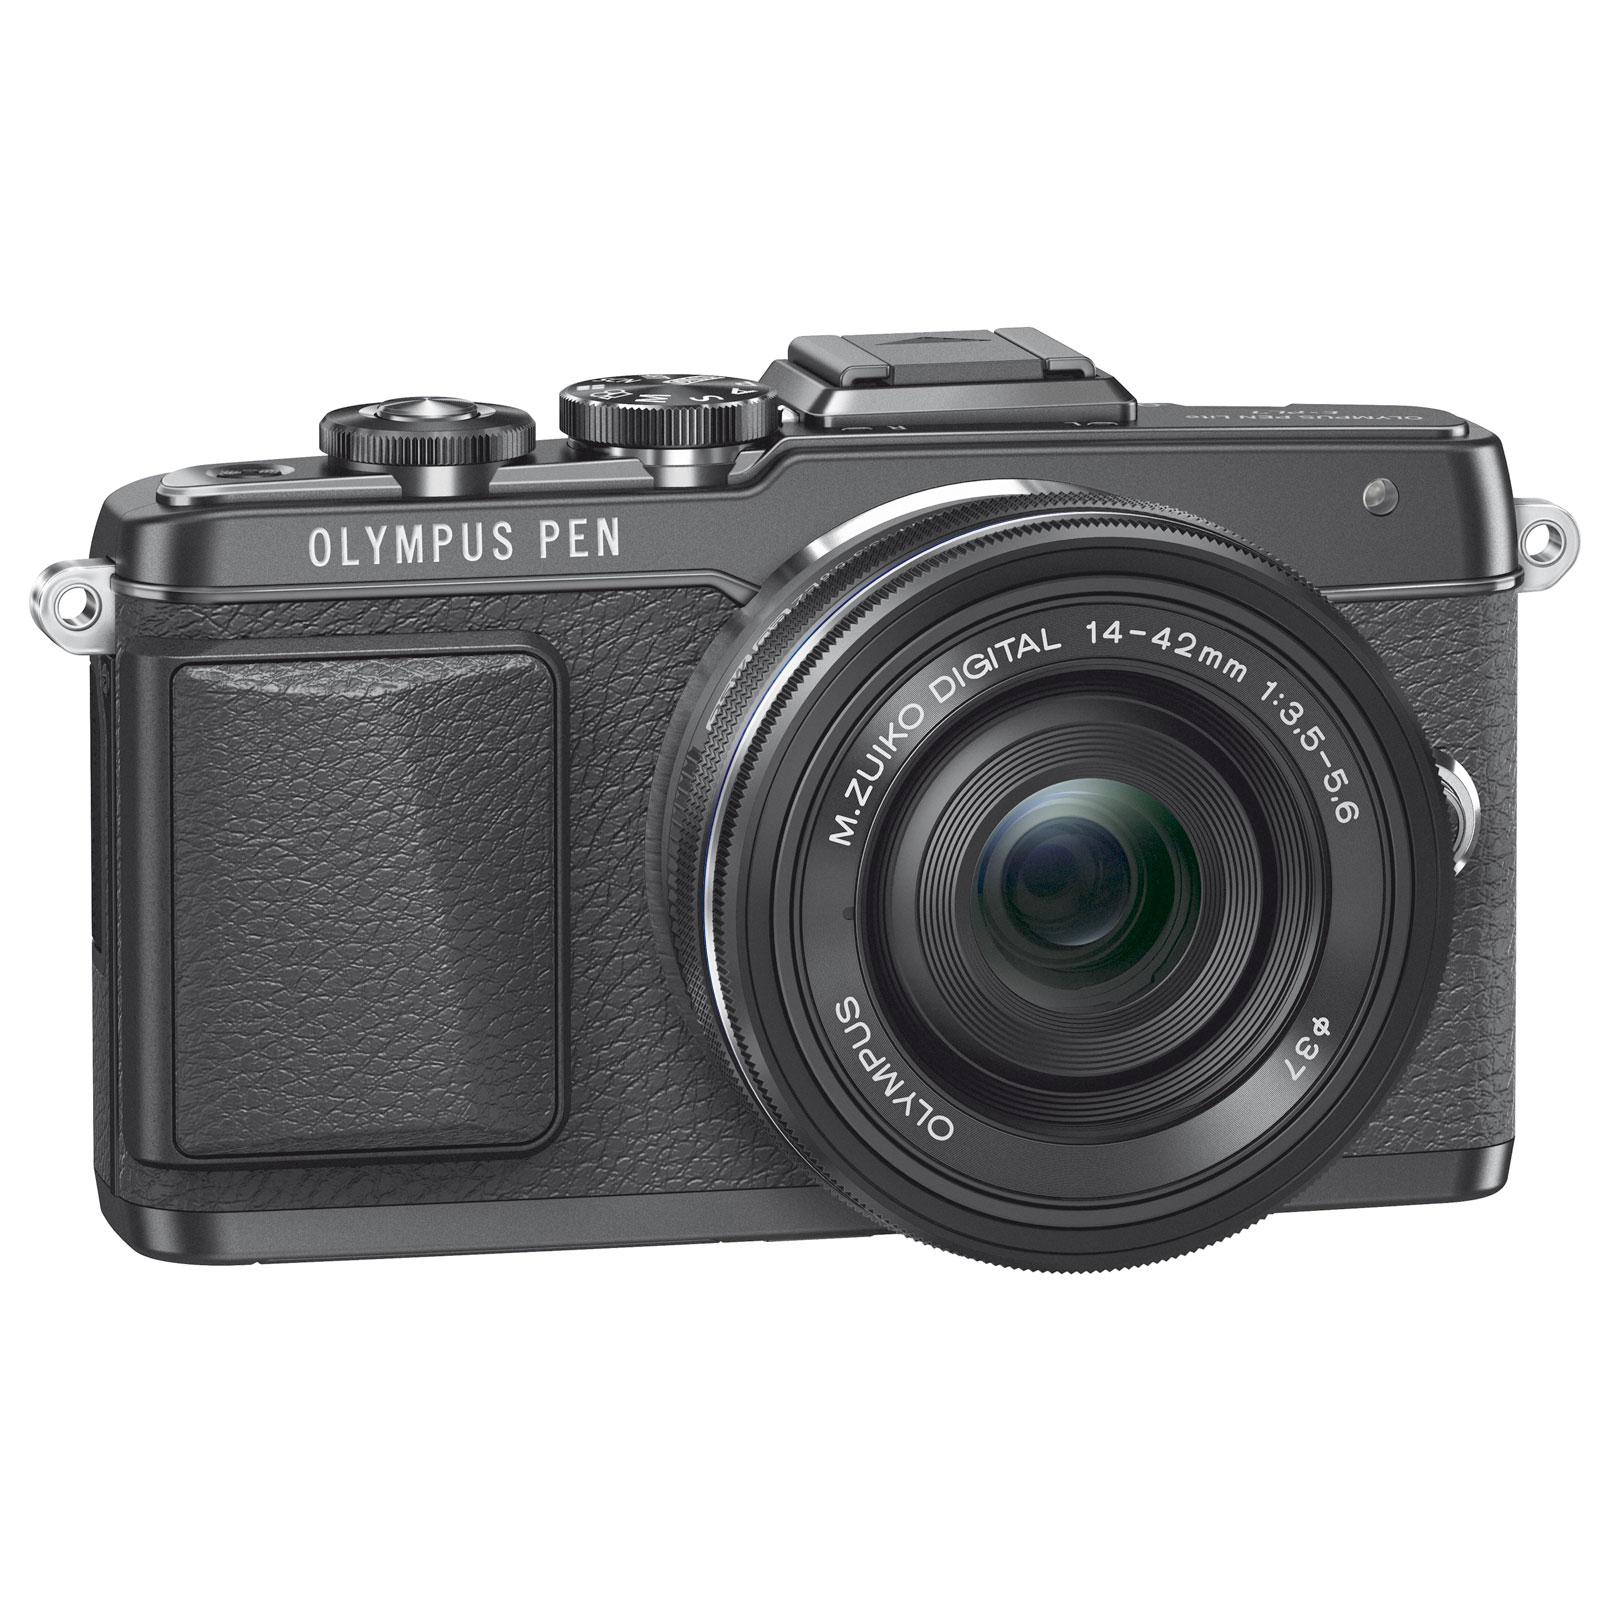 "Appareil photo hybride Olympus E-PL7 Noir + Objectif M.ZUIKO DIGITAL 14-42mm 1:3.5-5.6 II R Noir Appareil photo hybride 16.1 MP - Ecran LCD tactile orientable 3"" - Vidéo Full HD - Wi-Fi"